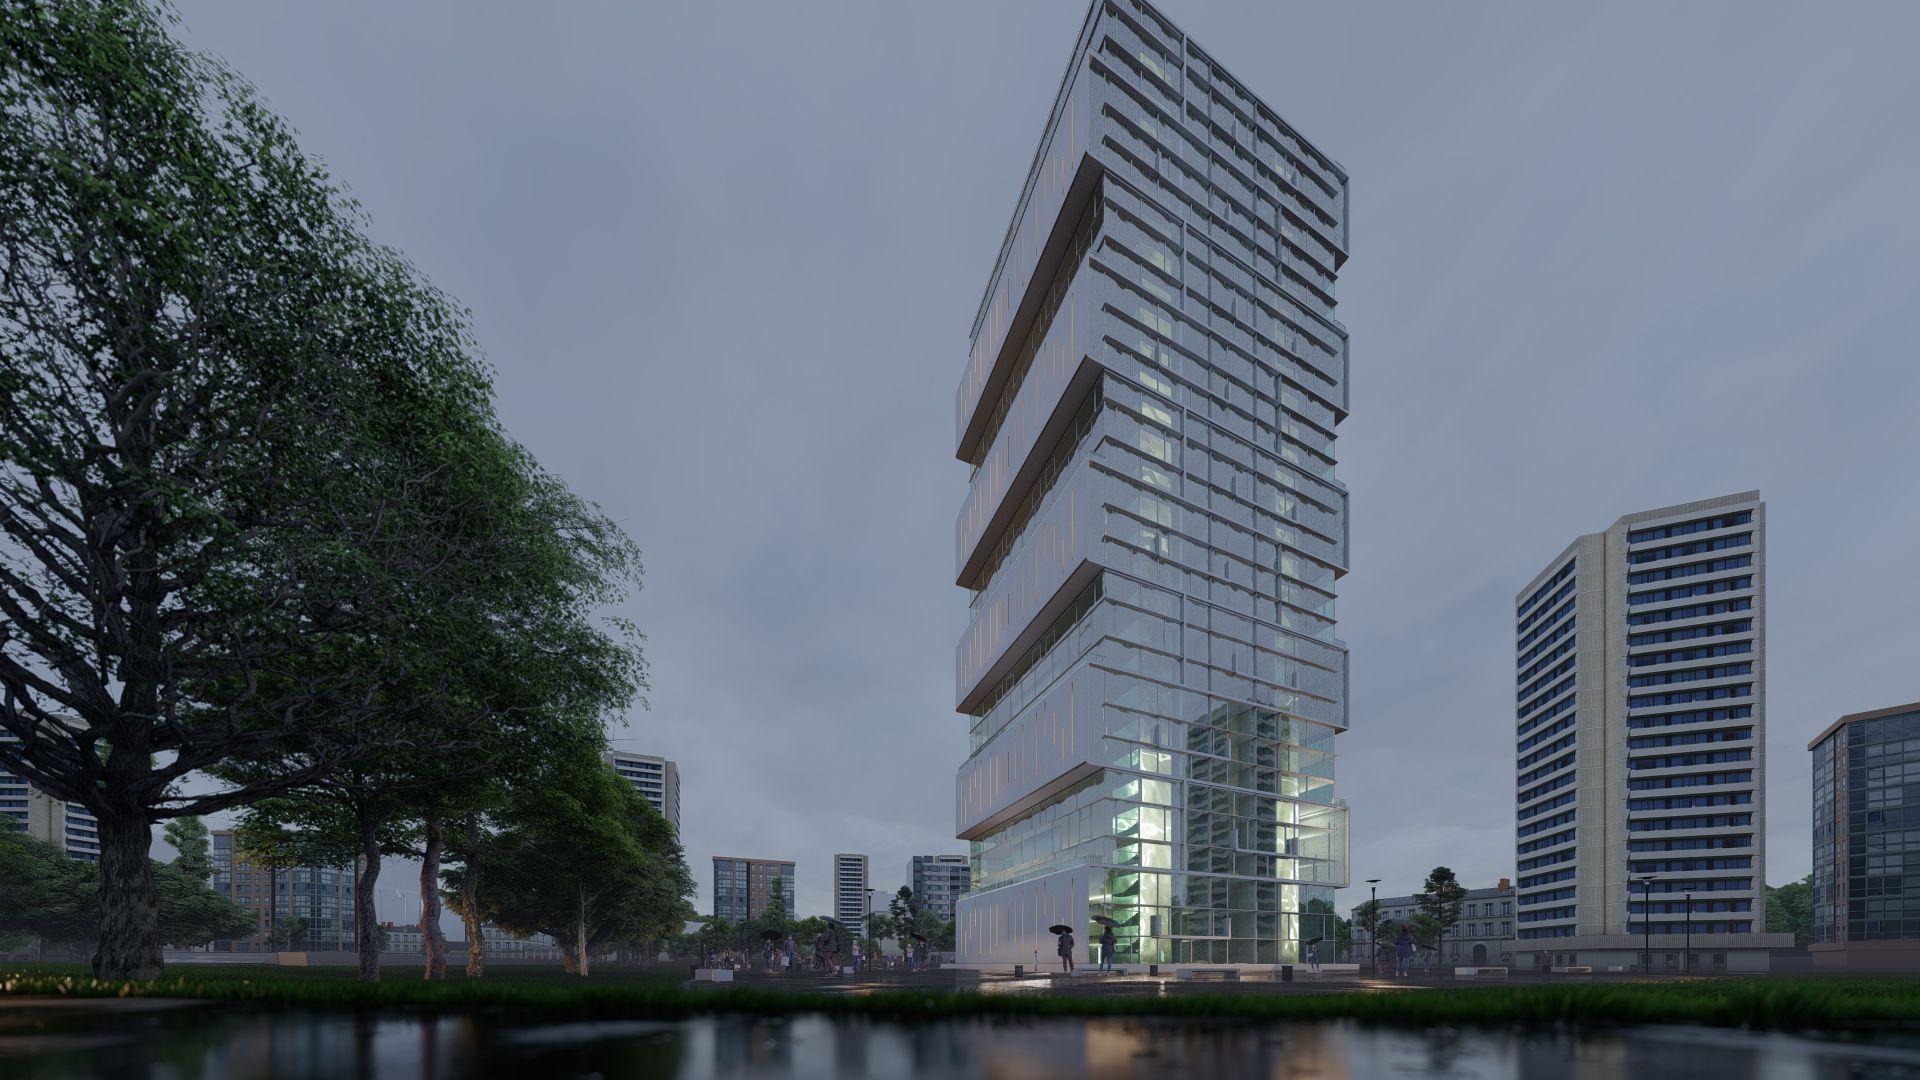 arhitektuurne 3d visualiseerimine pilve hoone 3 2